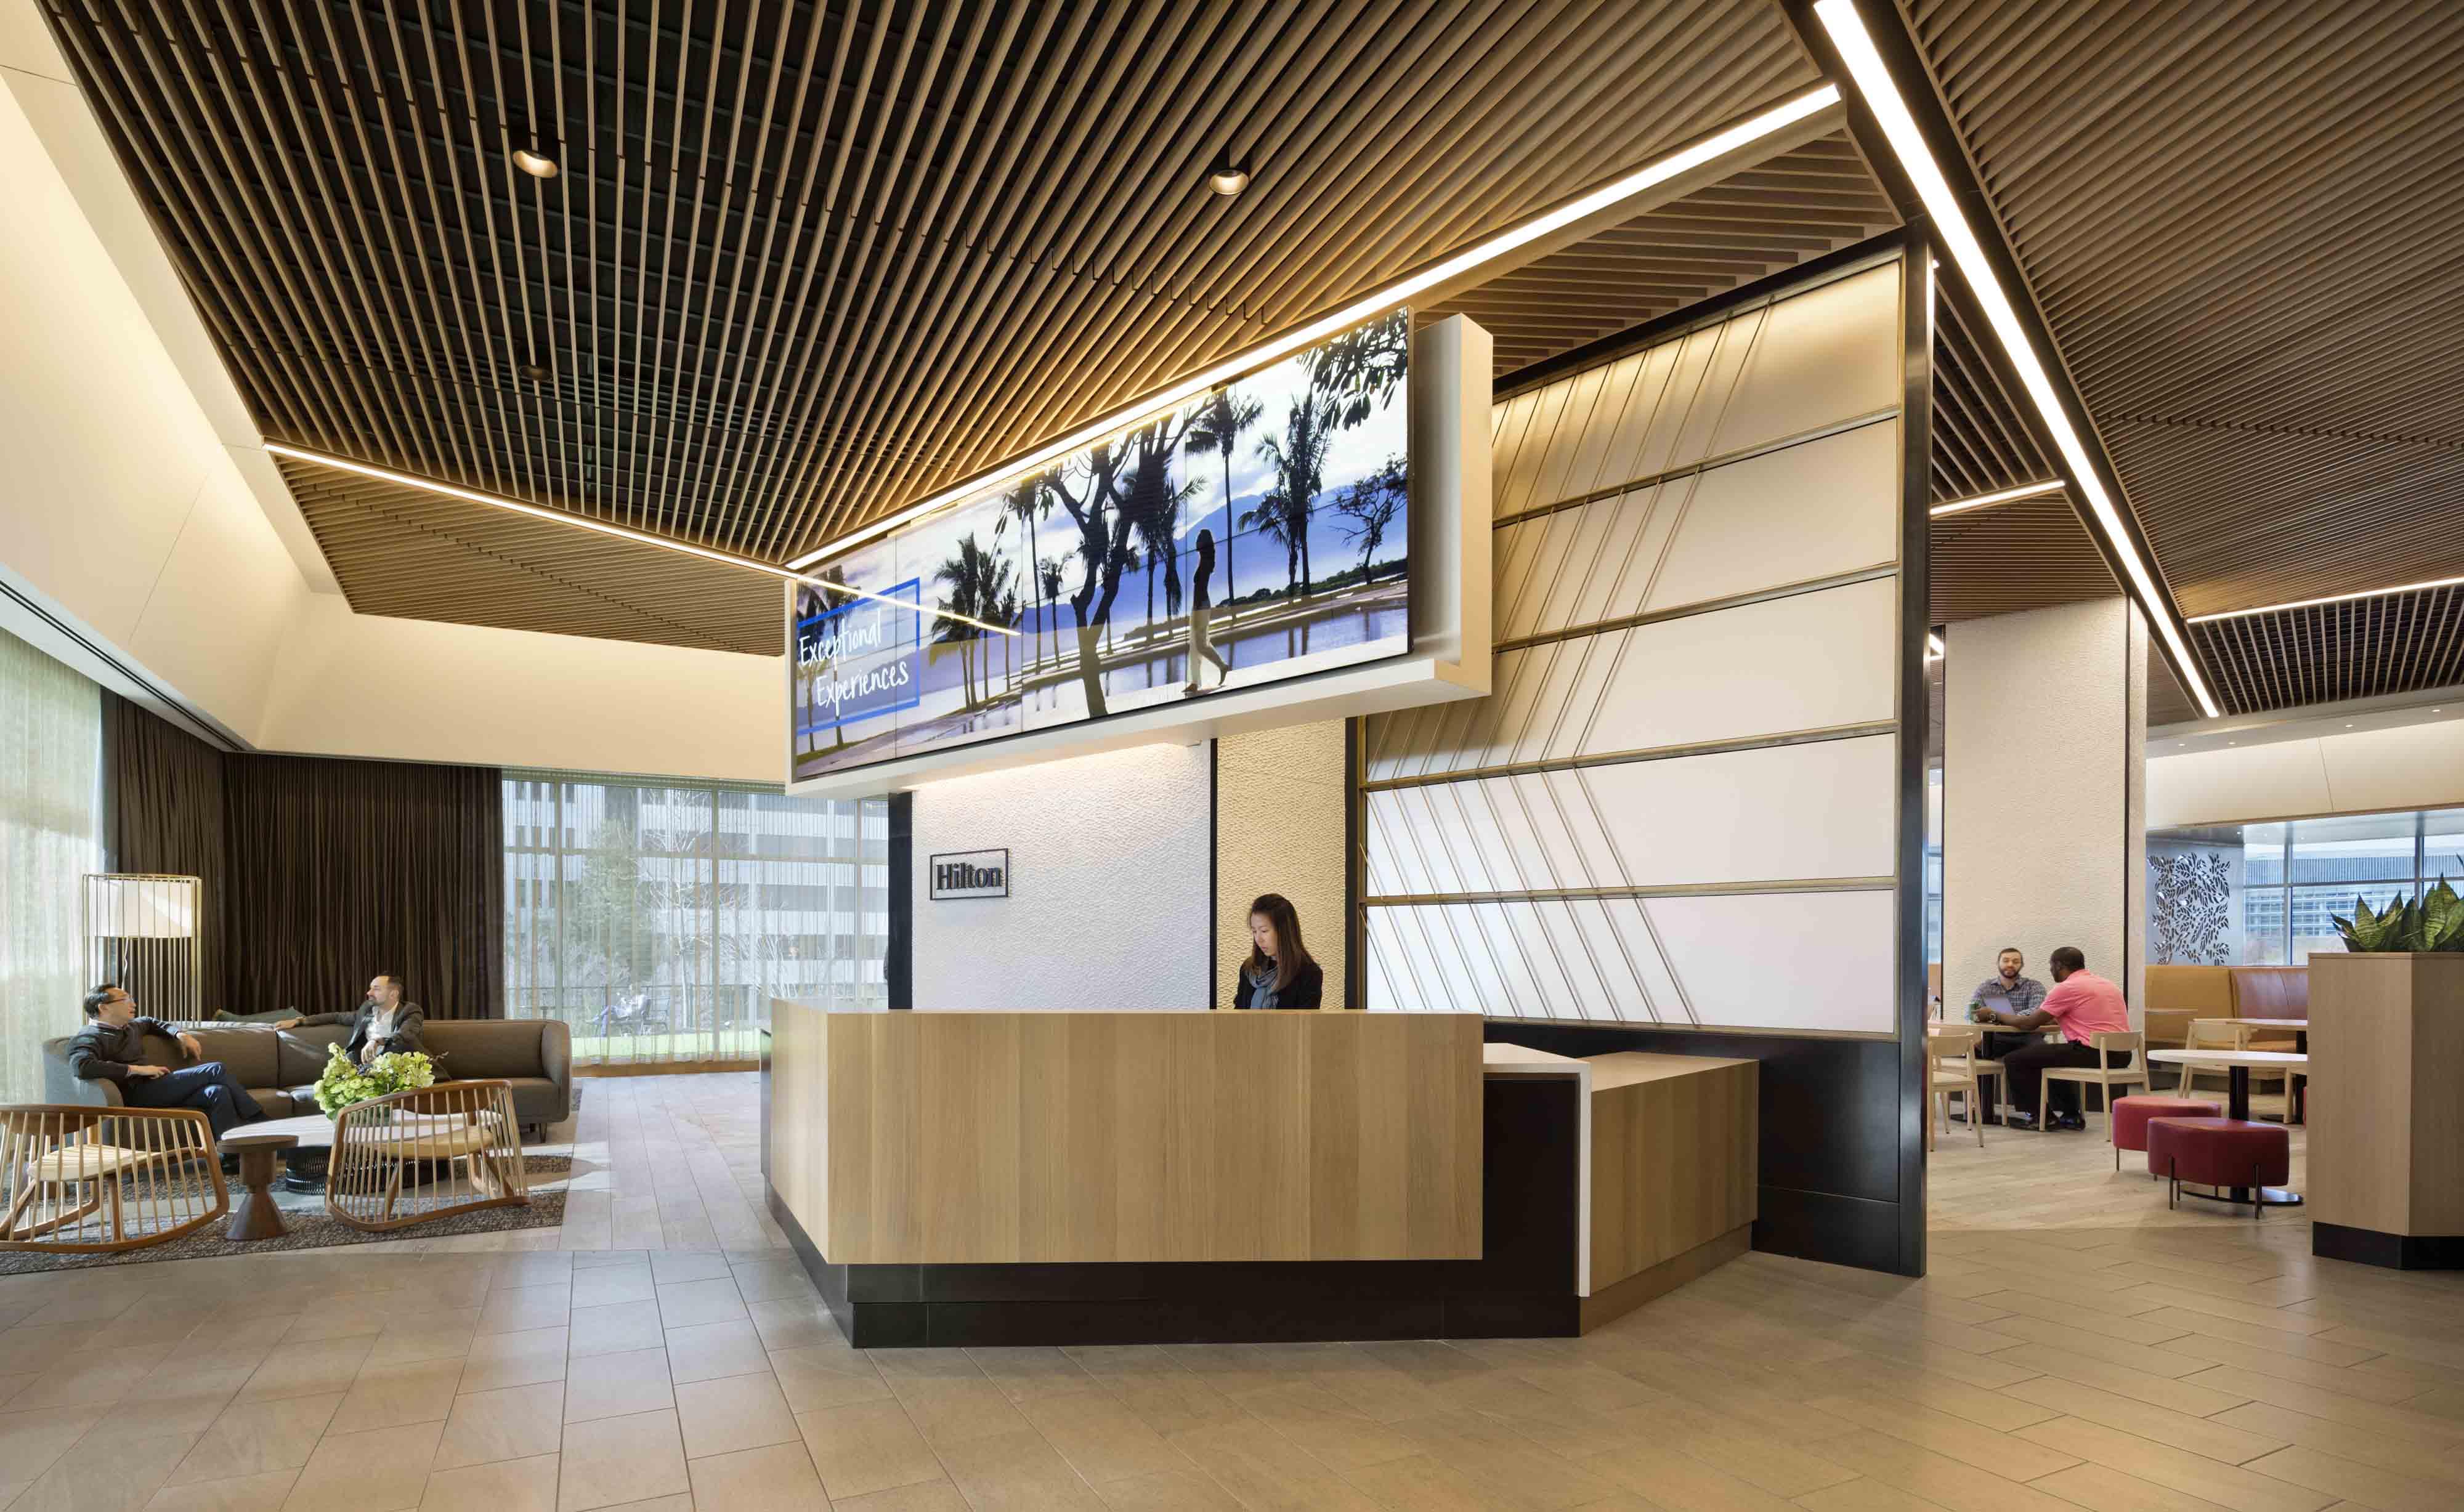 Hilton headquarters the social architect magazine - Commercial van interiors locations ...